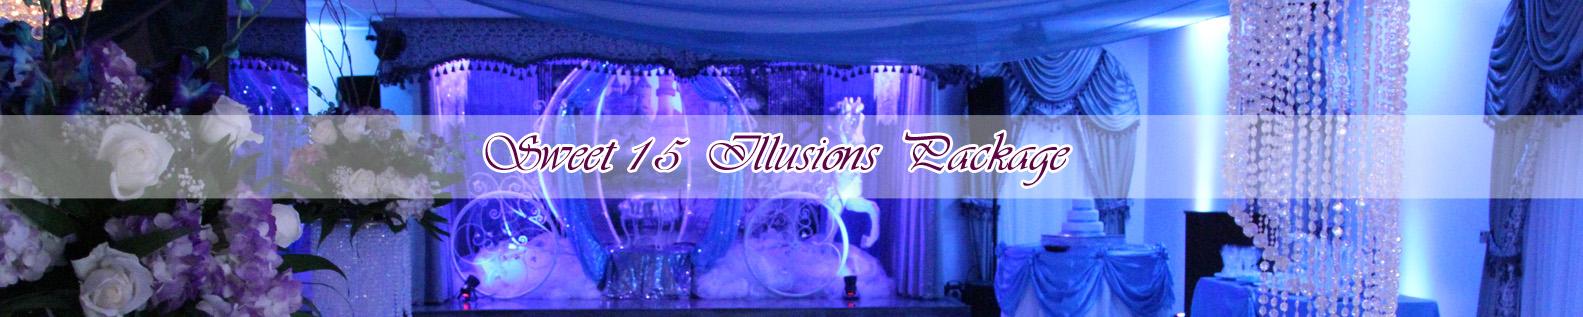 Copyright 2016 olga s reception halls 12260 sw 8 st miami fl